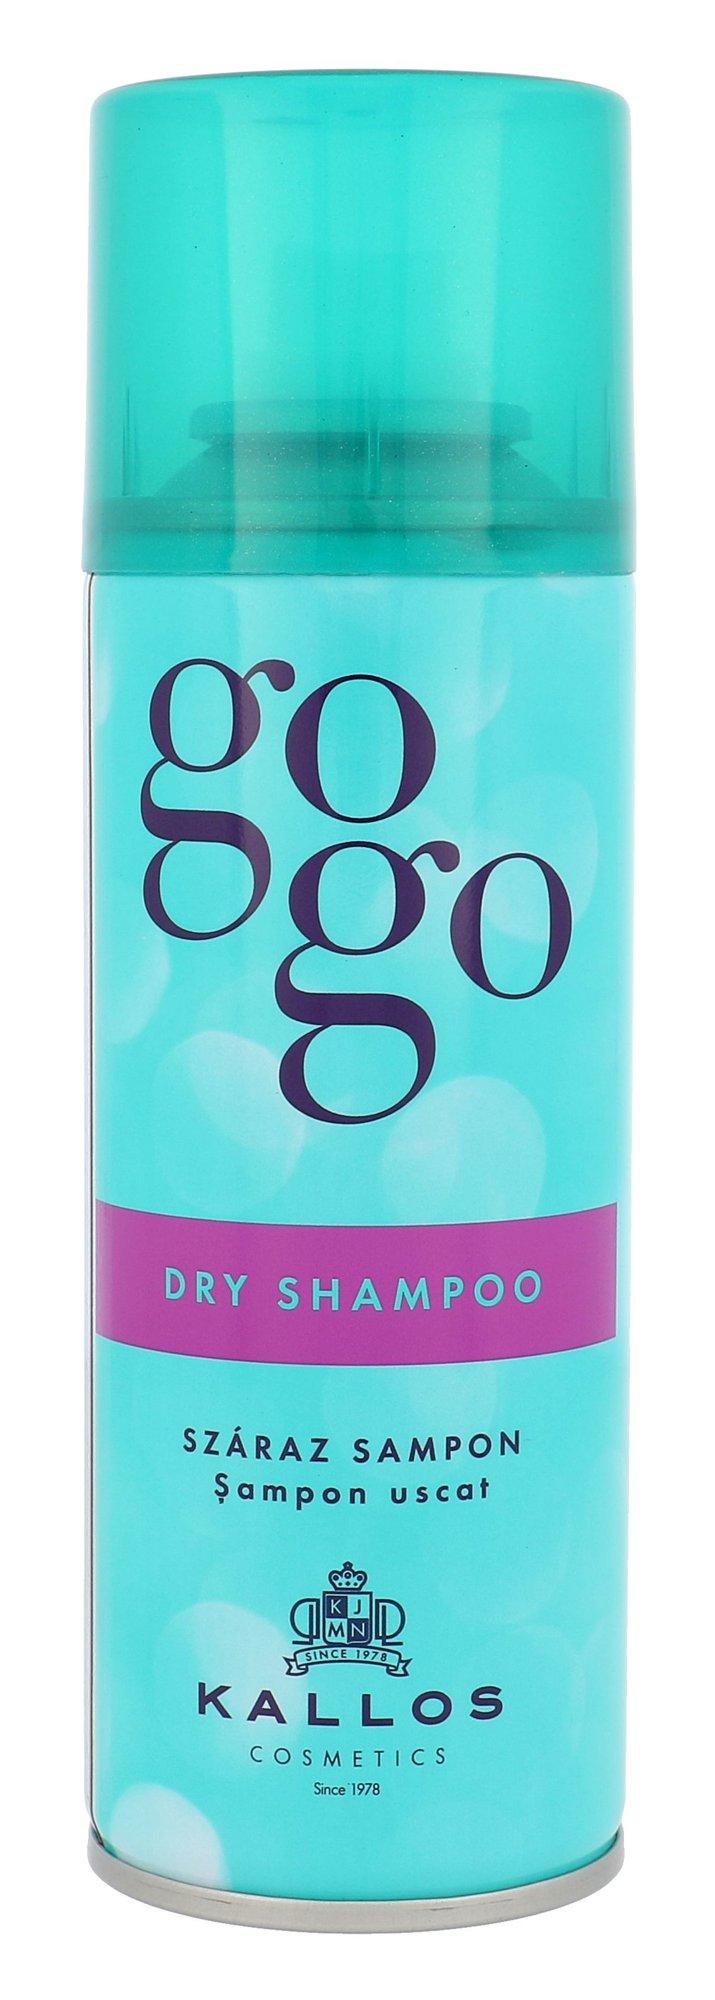 Kallos Cosmetics Gogo Dry Shampoo Cosmetic 200ml